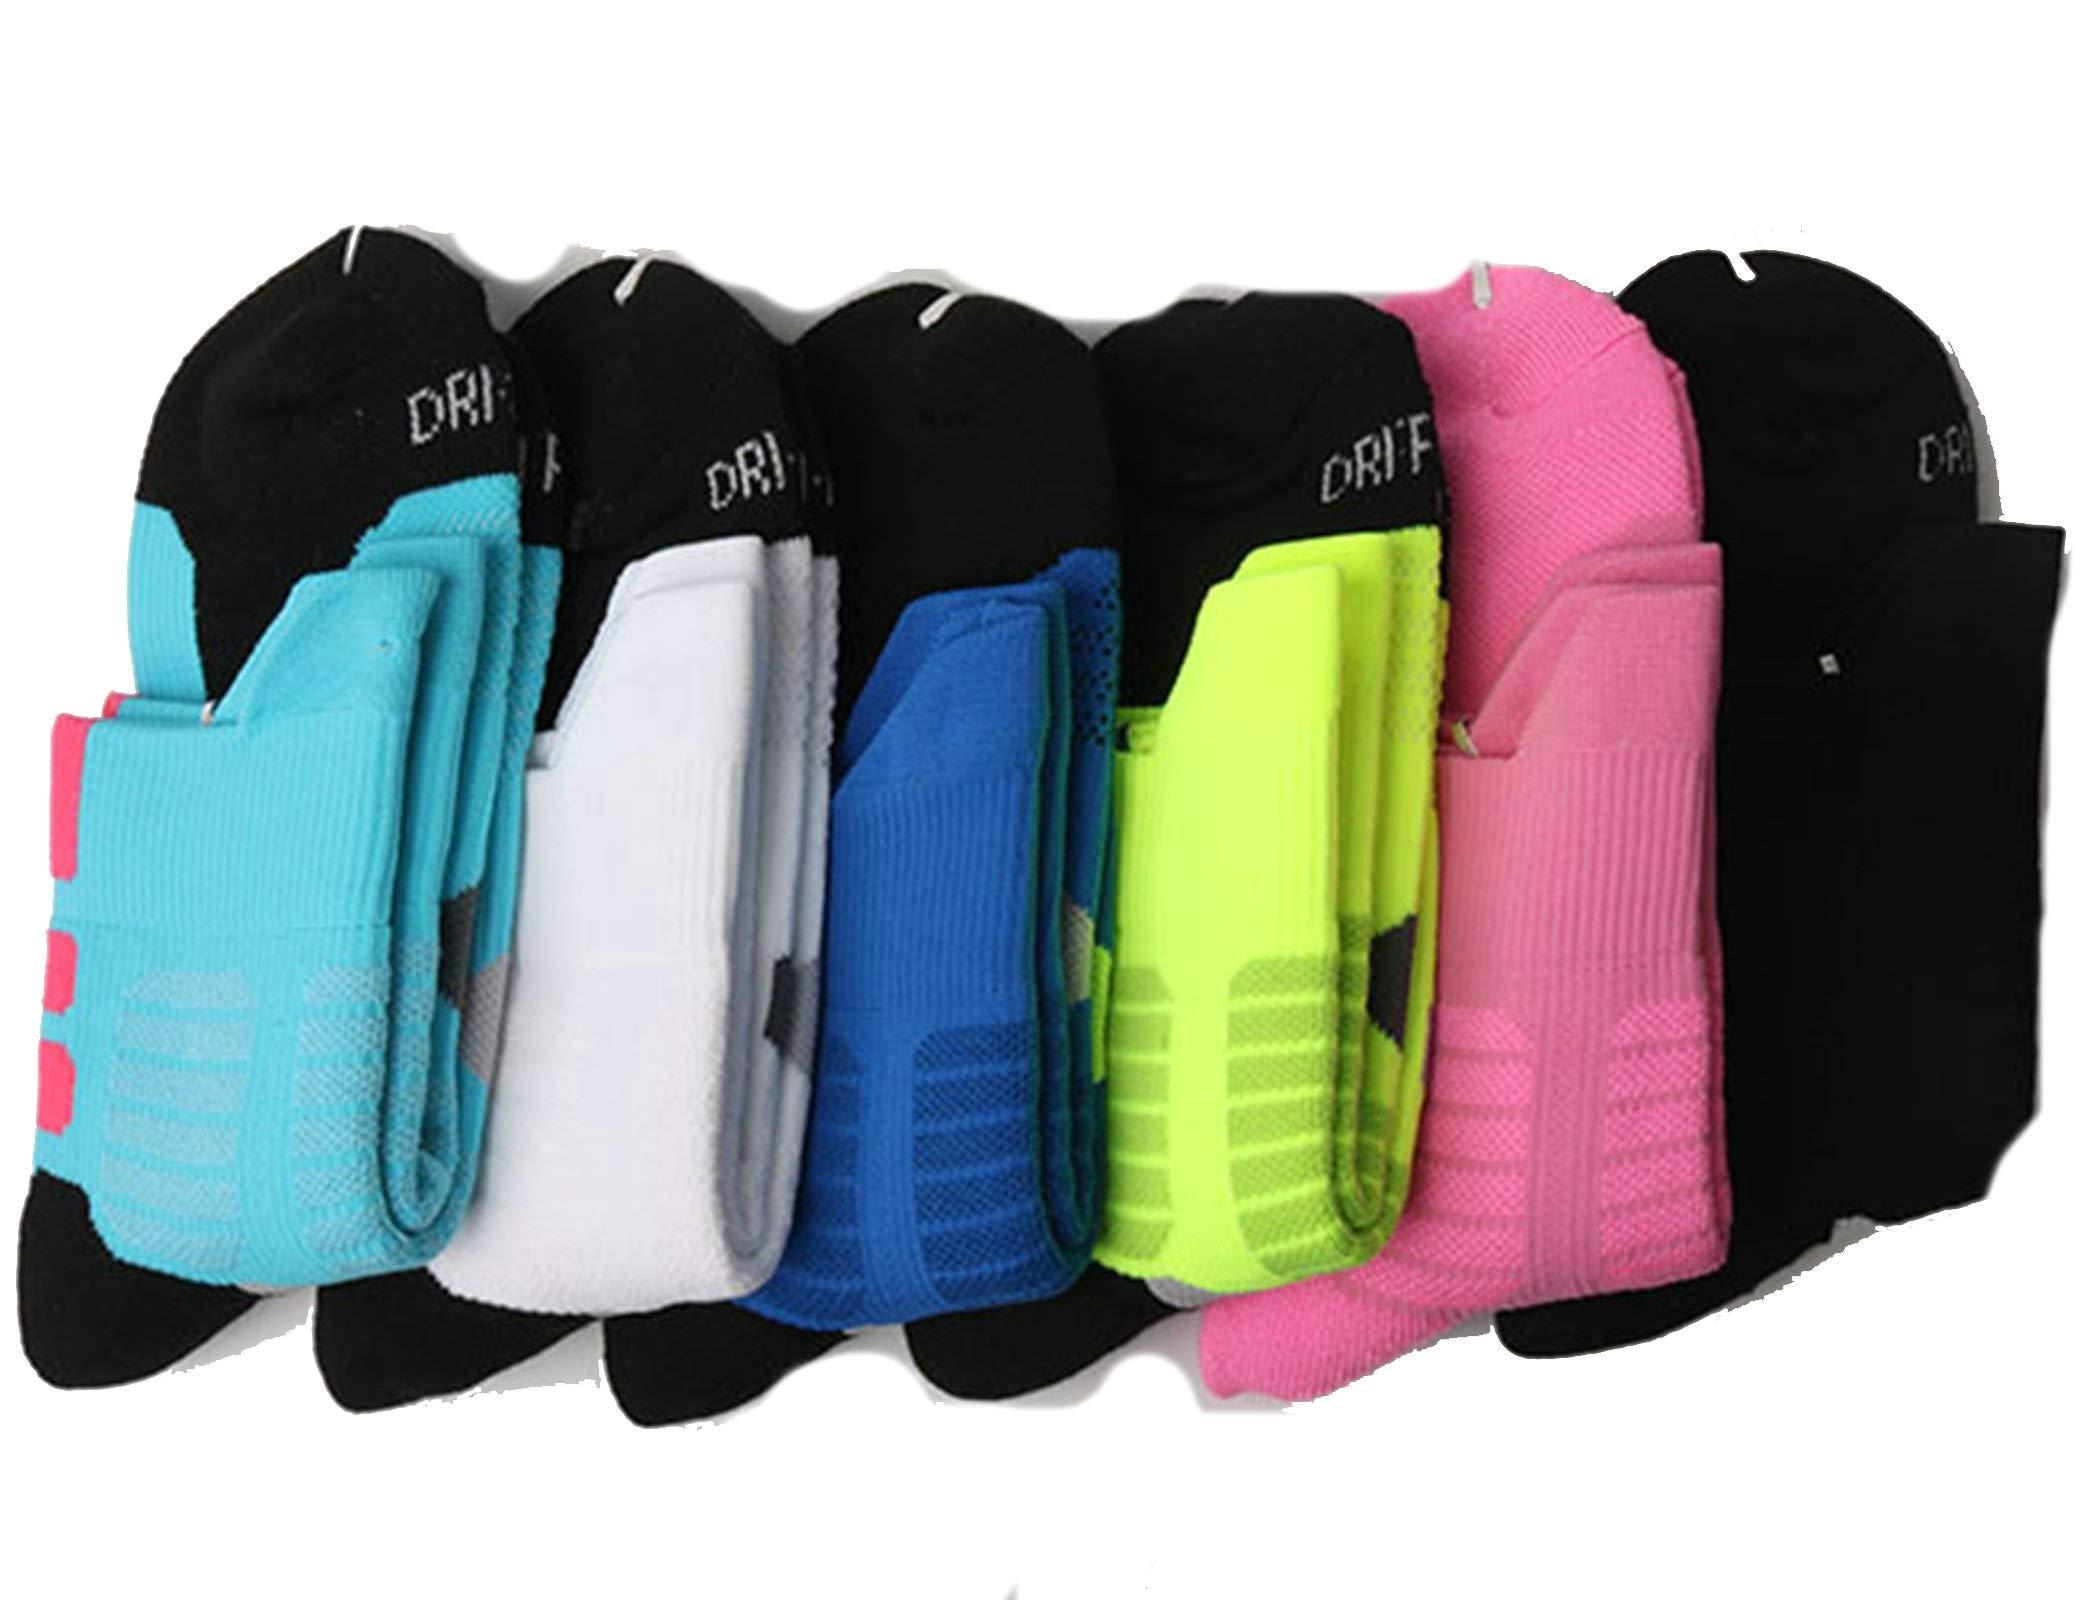 And Line Thick Towel Bottom Basketball Socks Medium-Length Sports Socks 6Pair